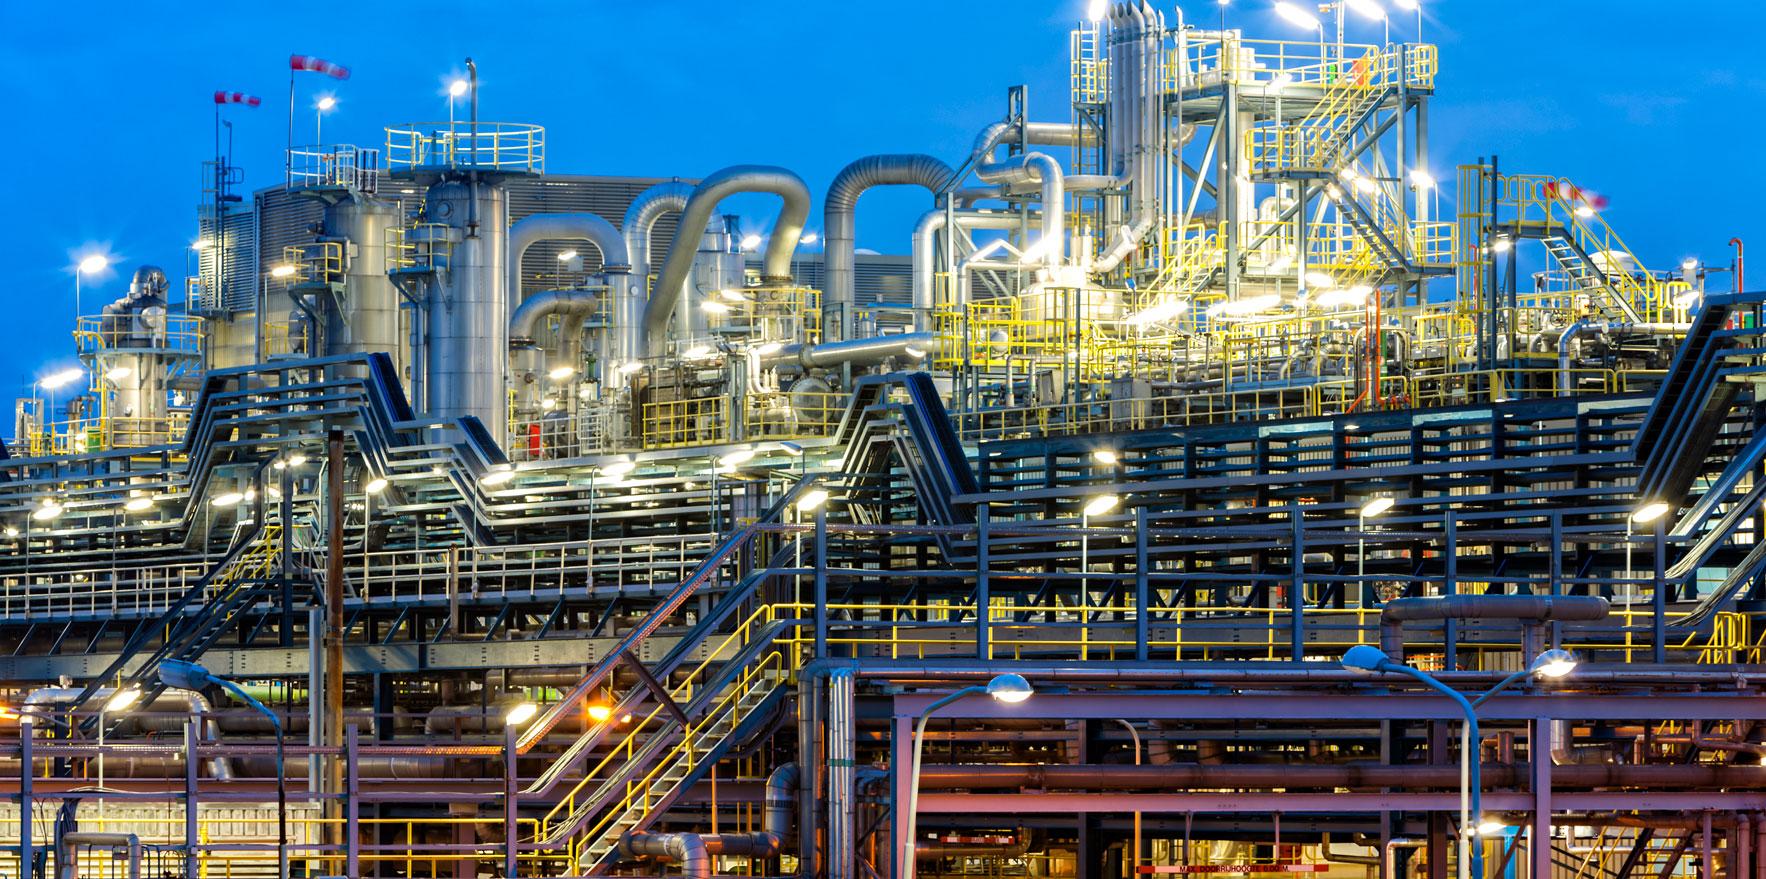 Marrar Carbon Brushes Factory